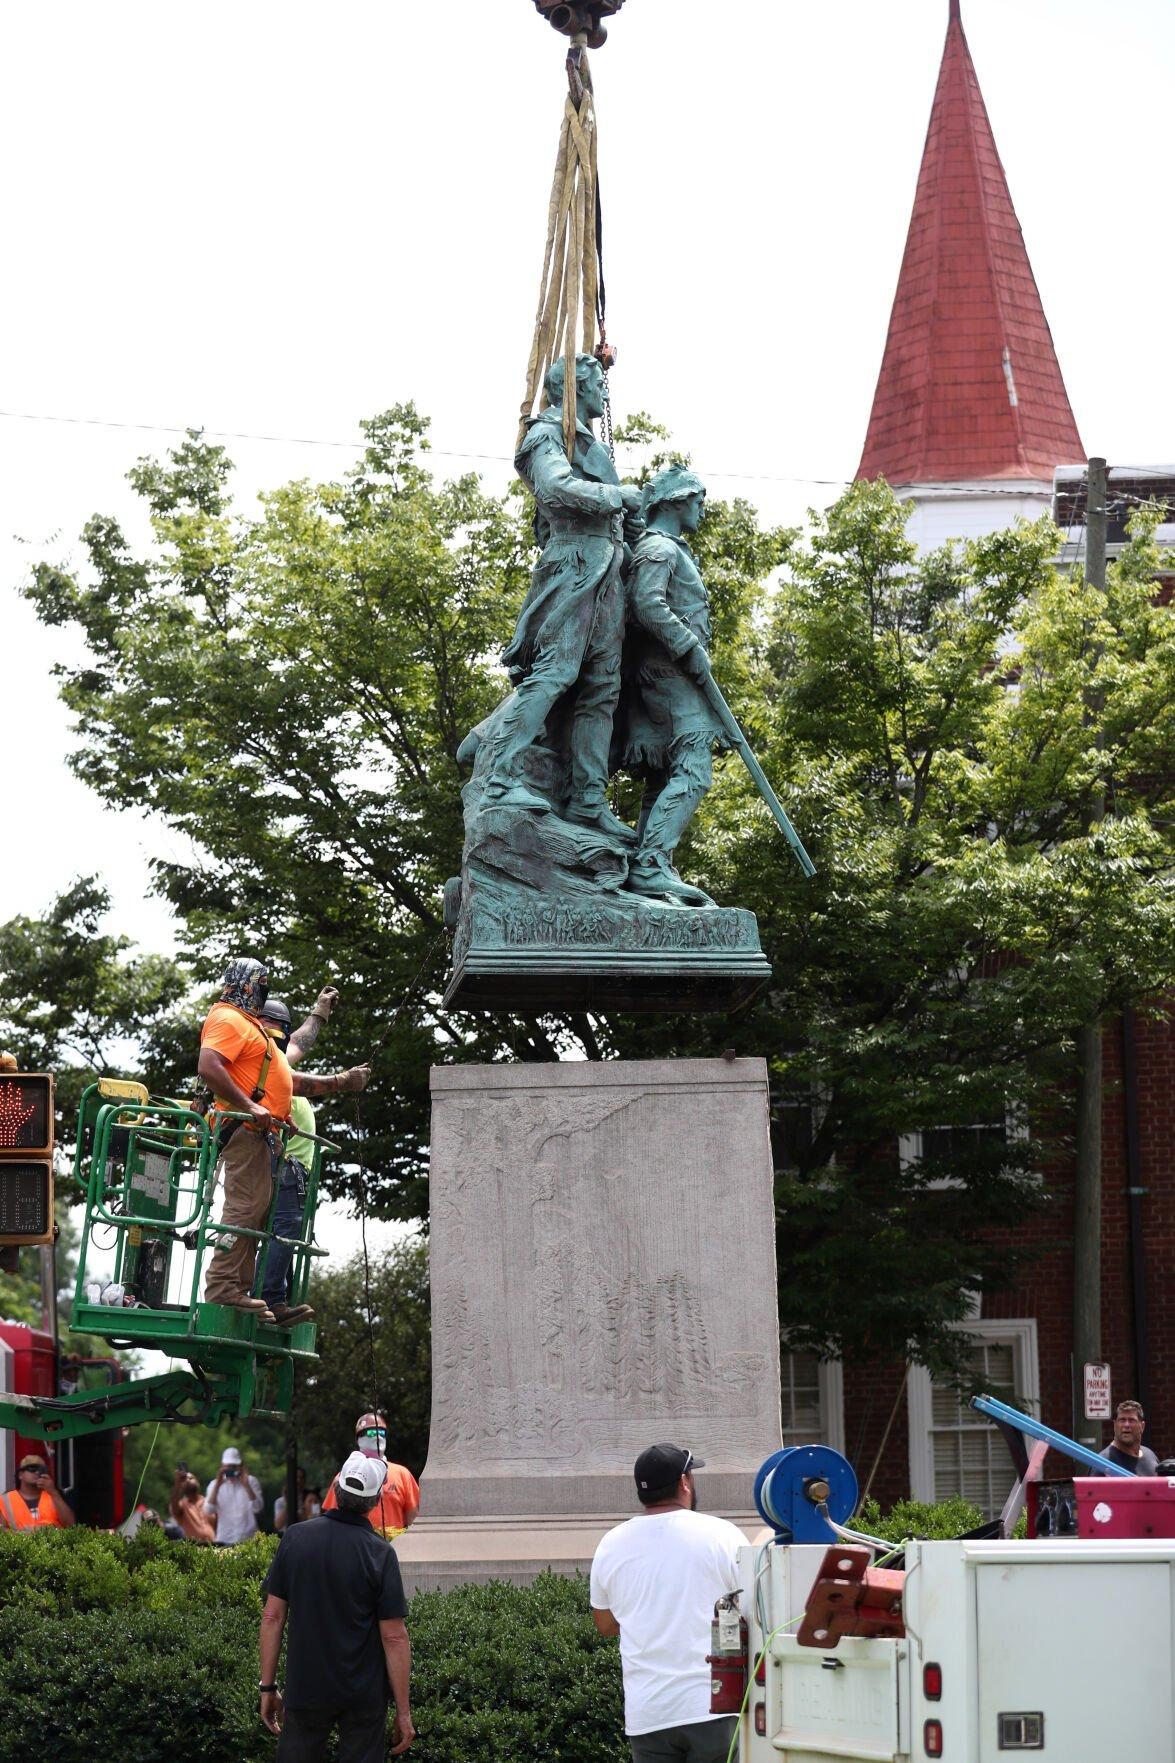 071021-cdp-news-statues129.JPG